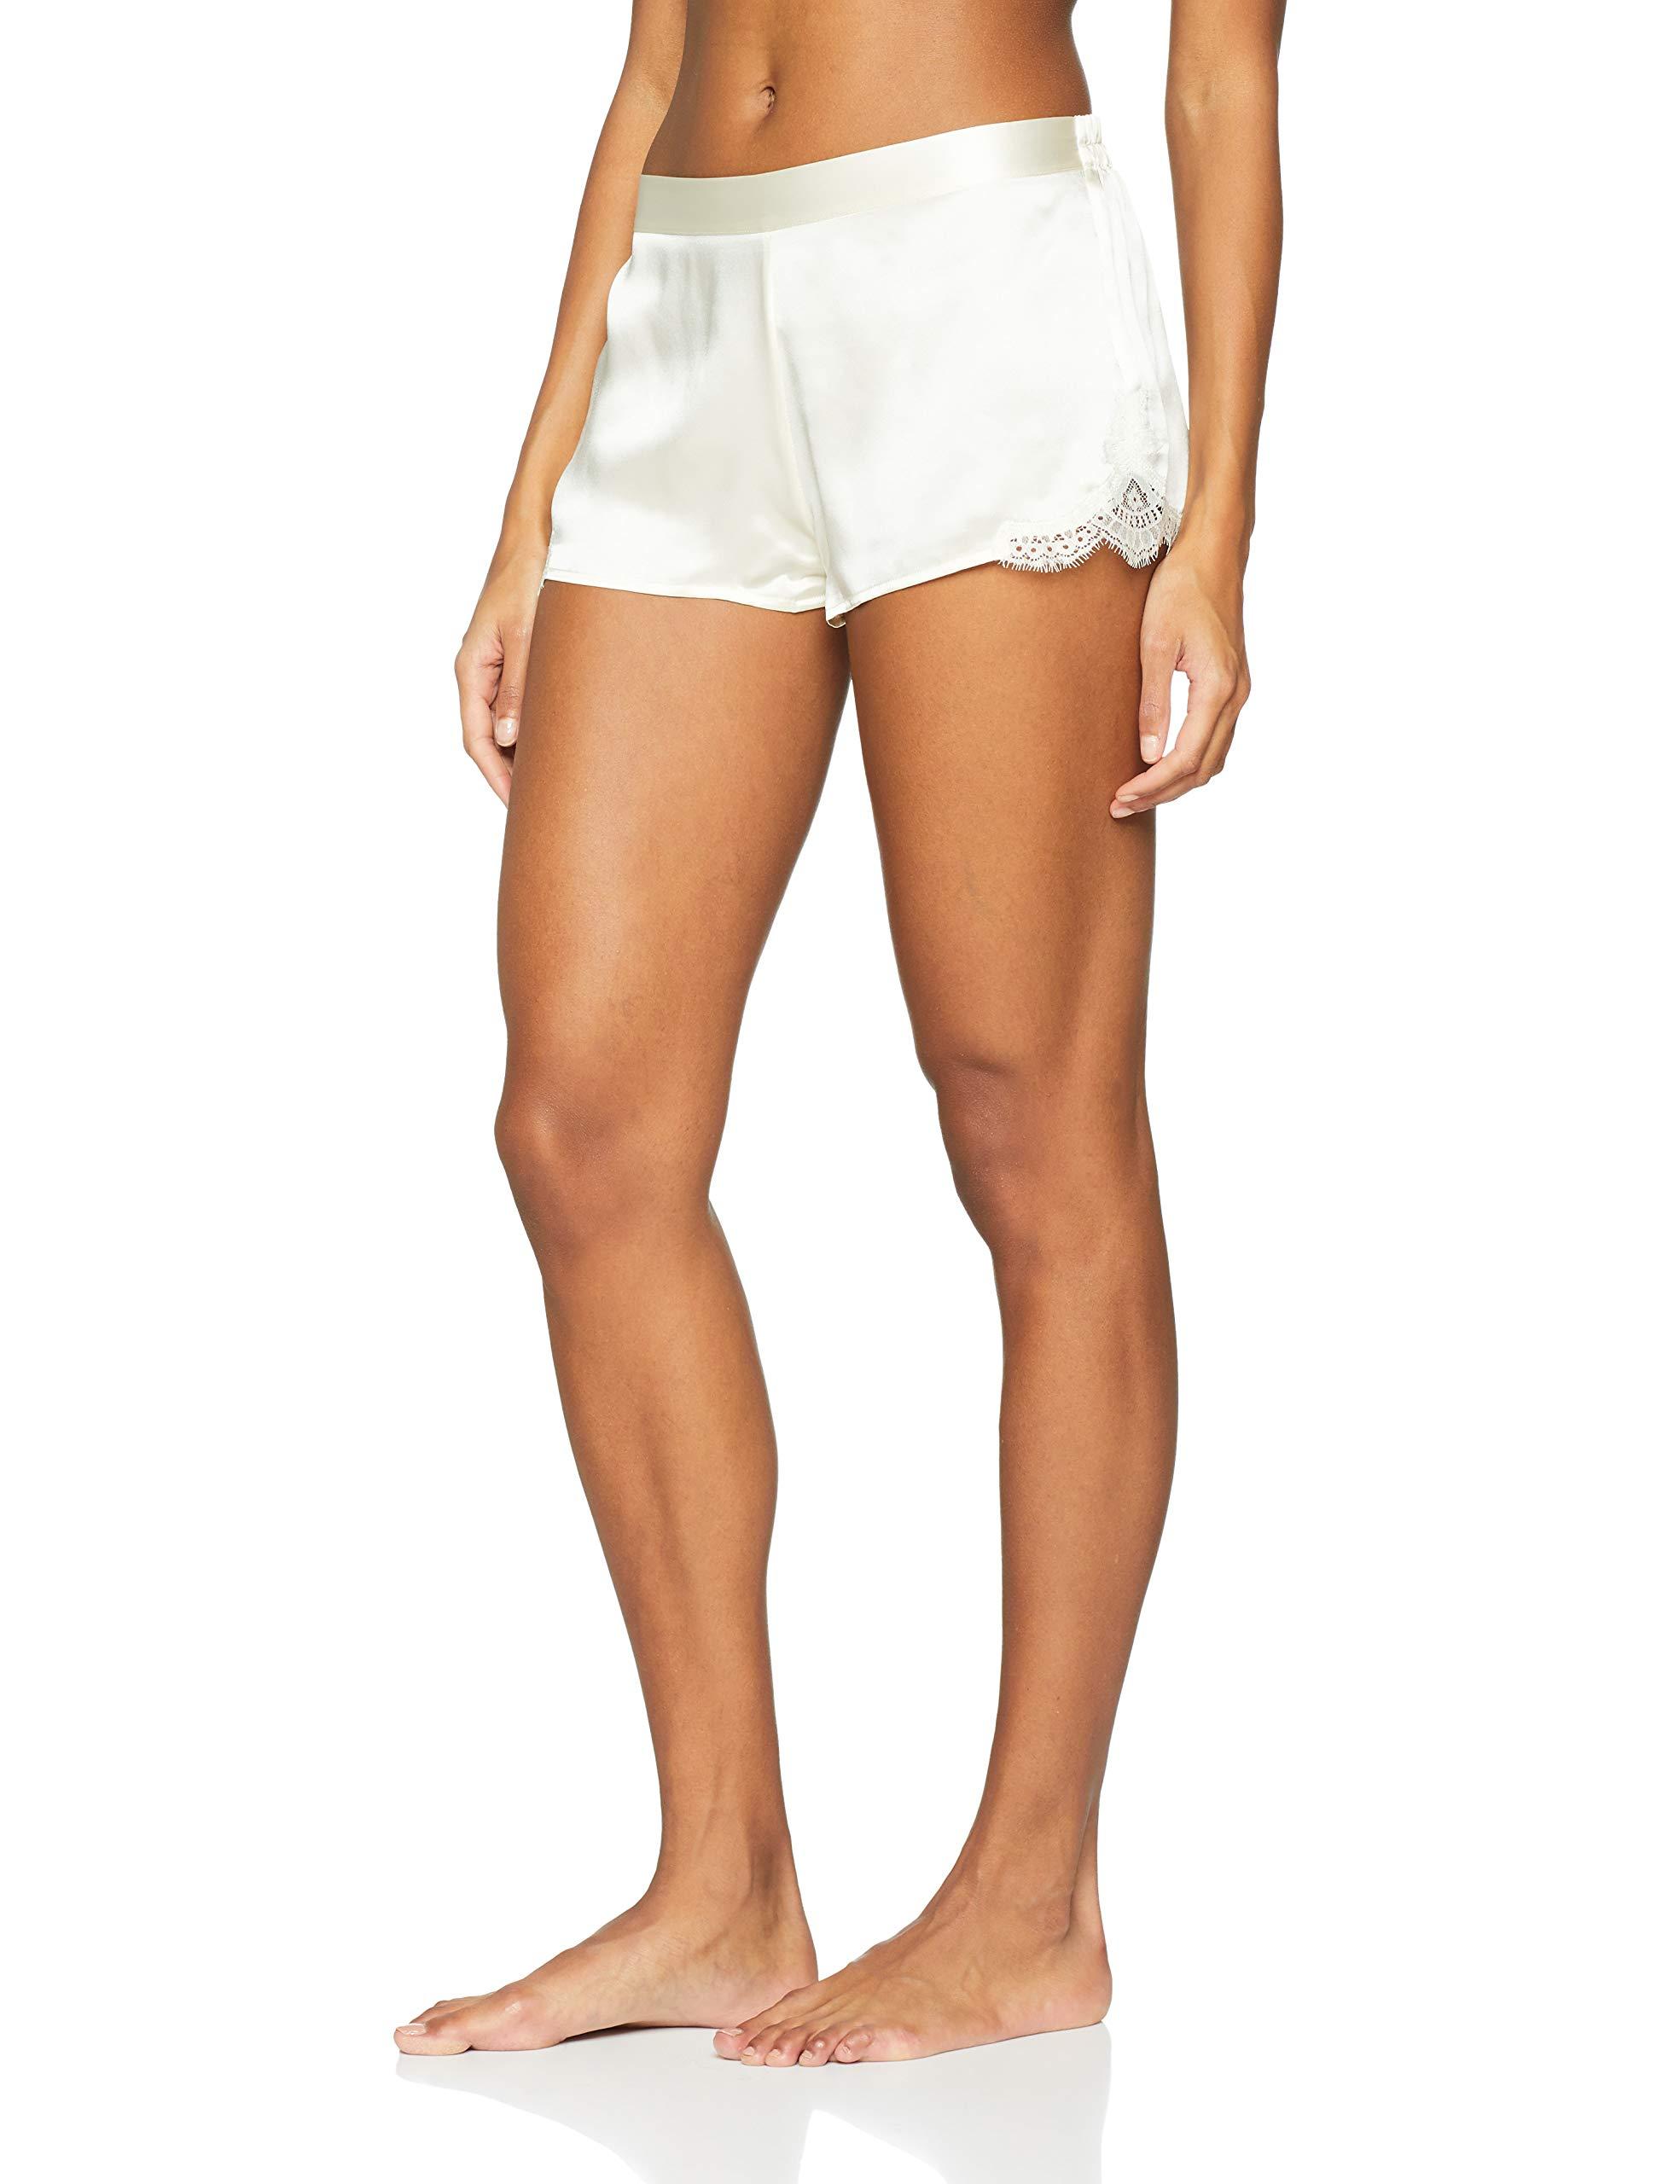 Fabricant36 Pyjama NacrFr De 1taille Aubade D'amourBas FemmeBeigenacre 0Ov8mnwN